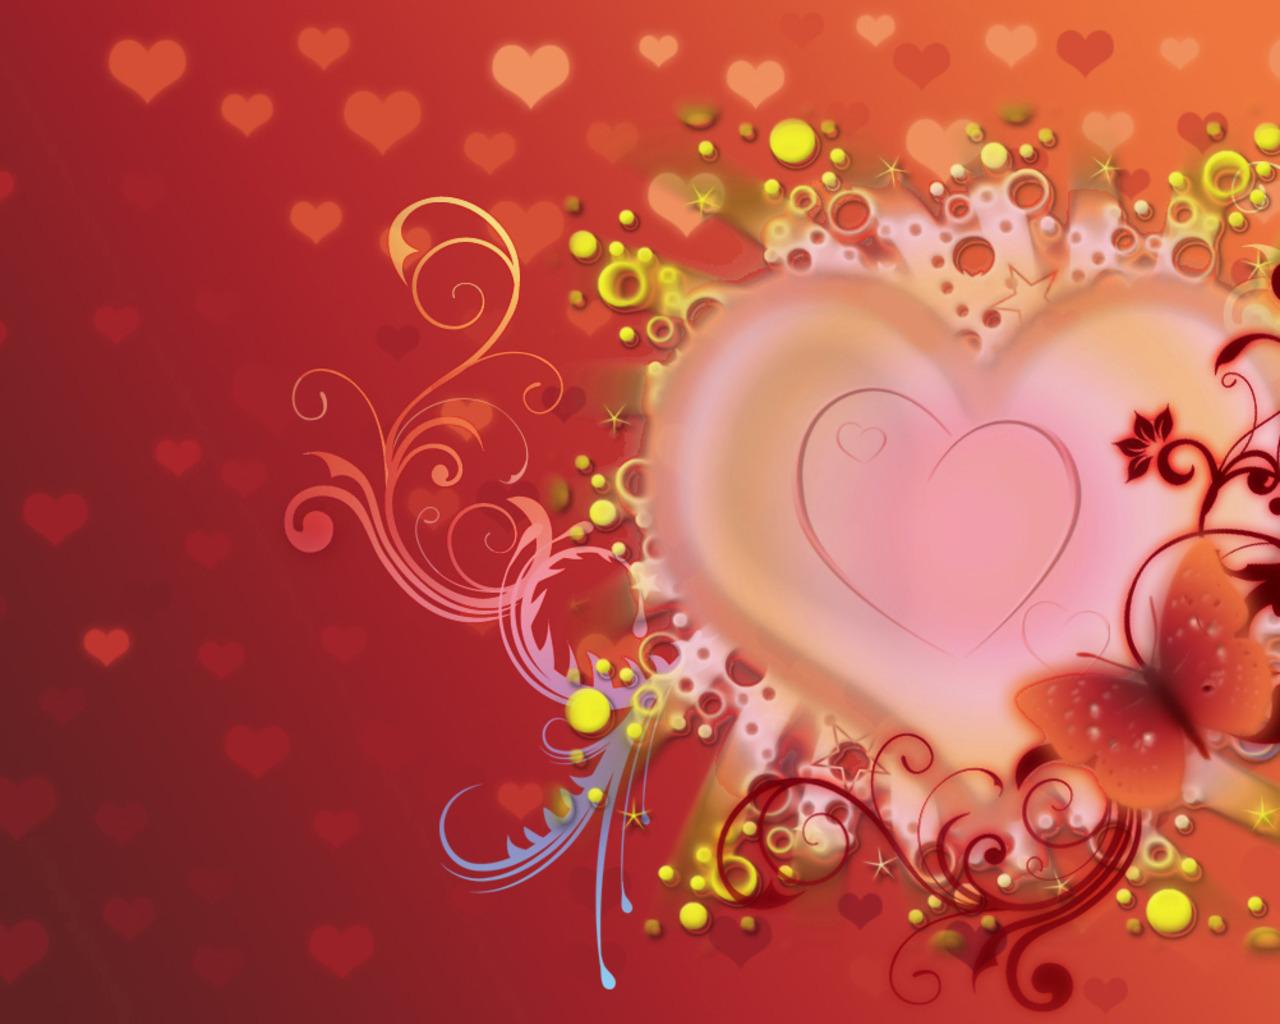 Valentine Desktop Wallpaper 1280x1024